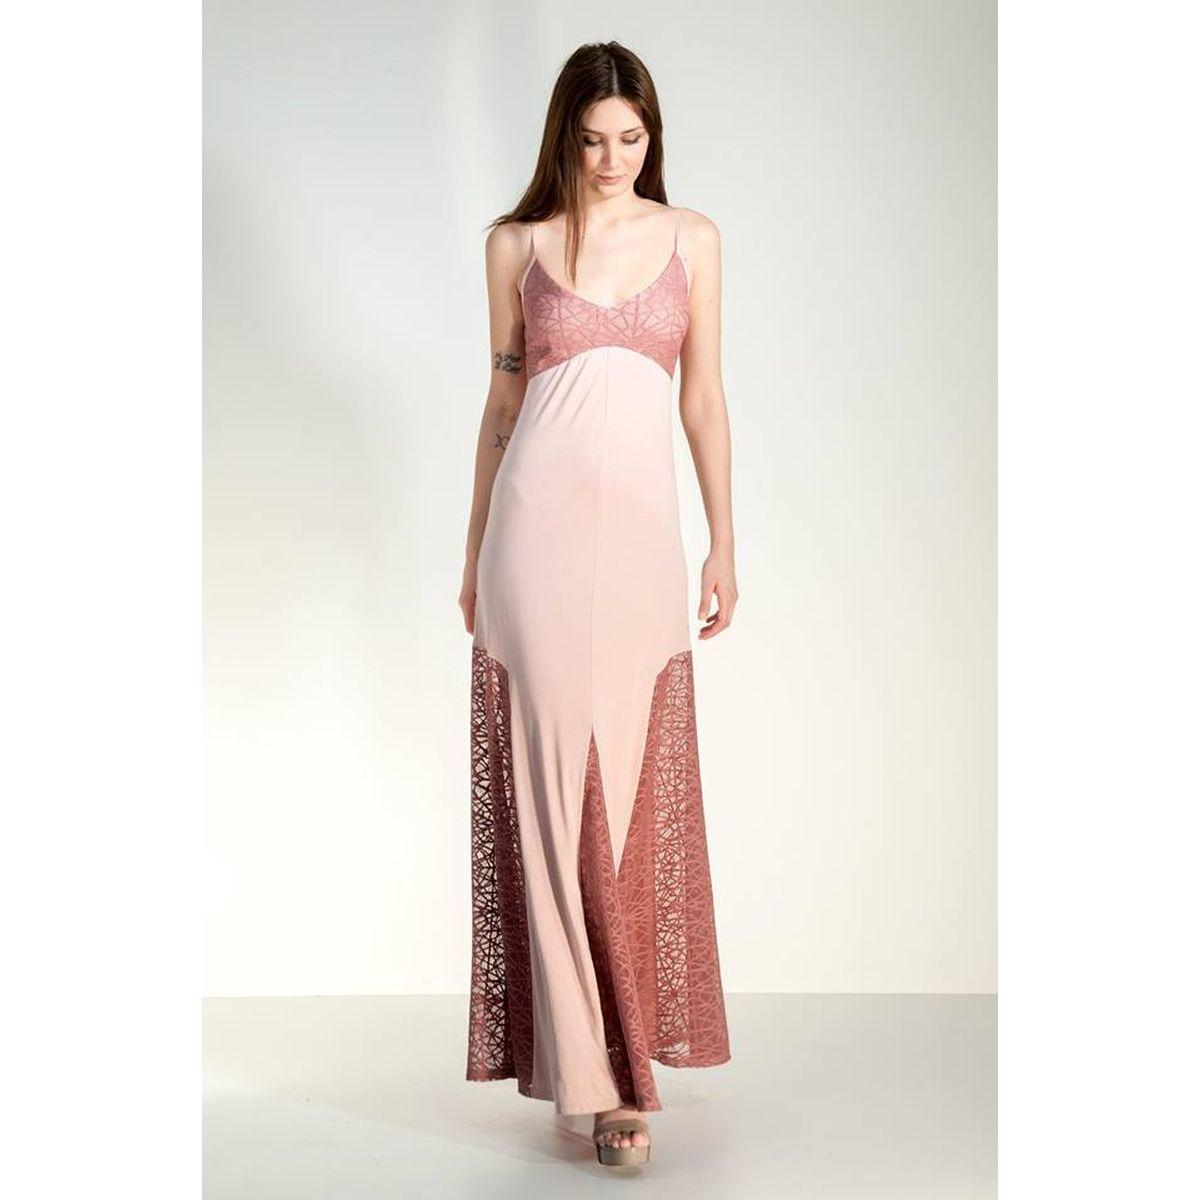 e9158351bd3 Τιράντα μακρύ φόρεμα με δαντέλες - Dressme